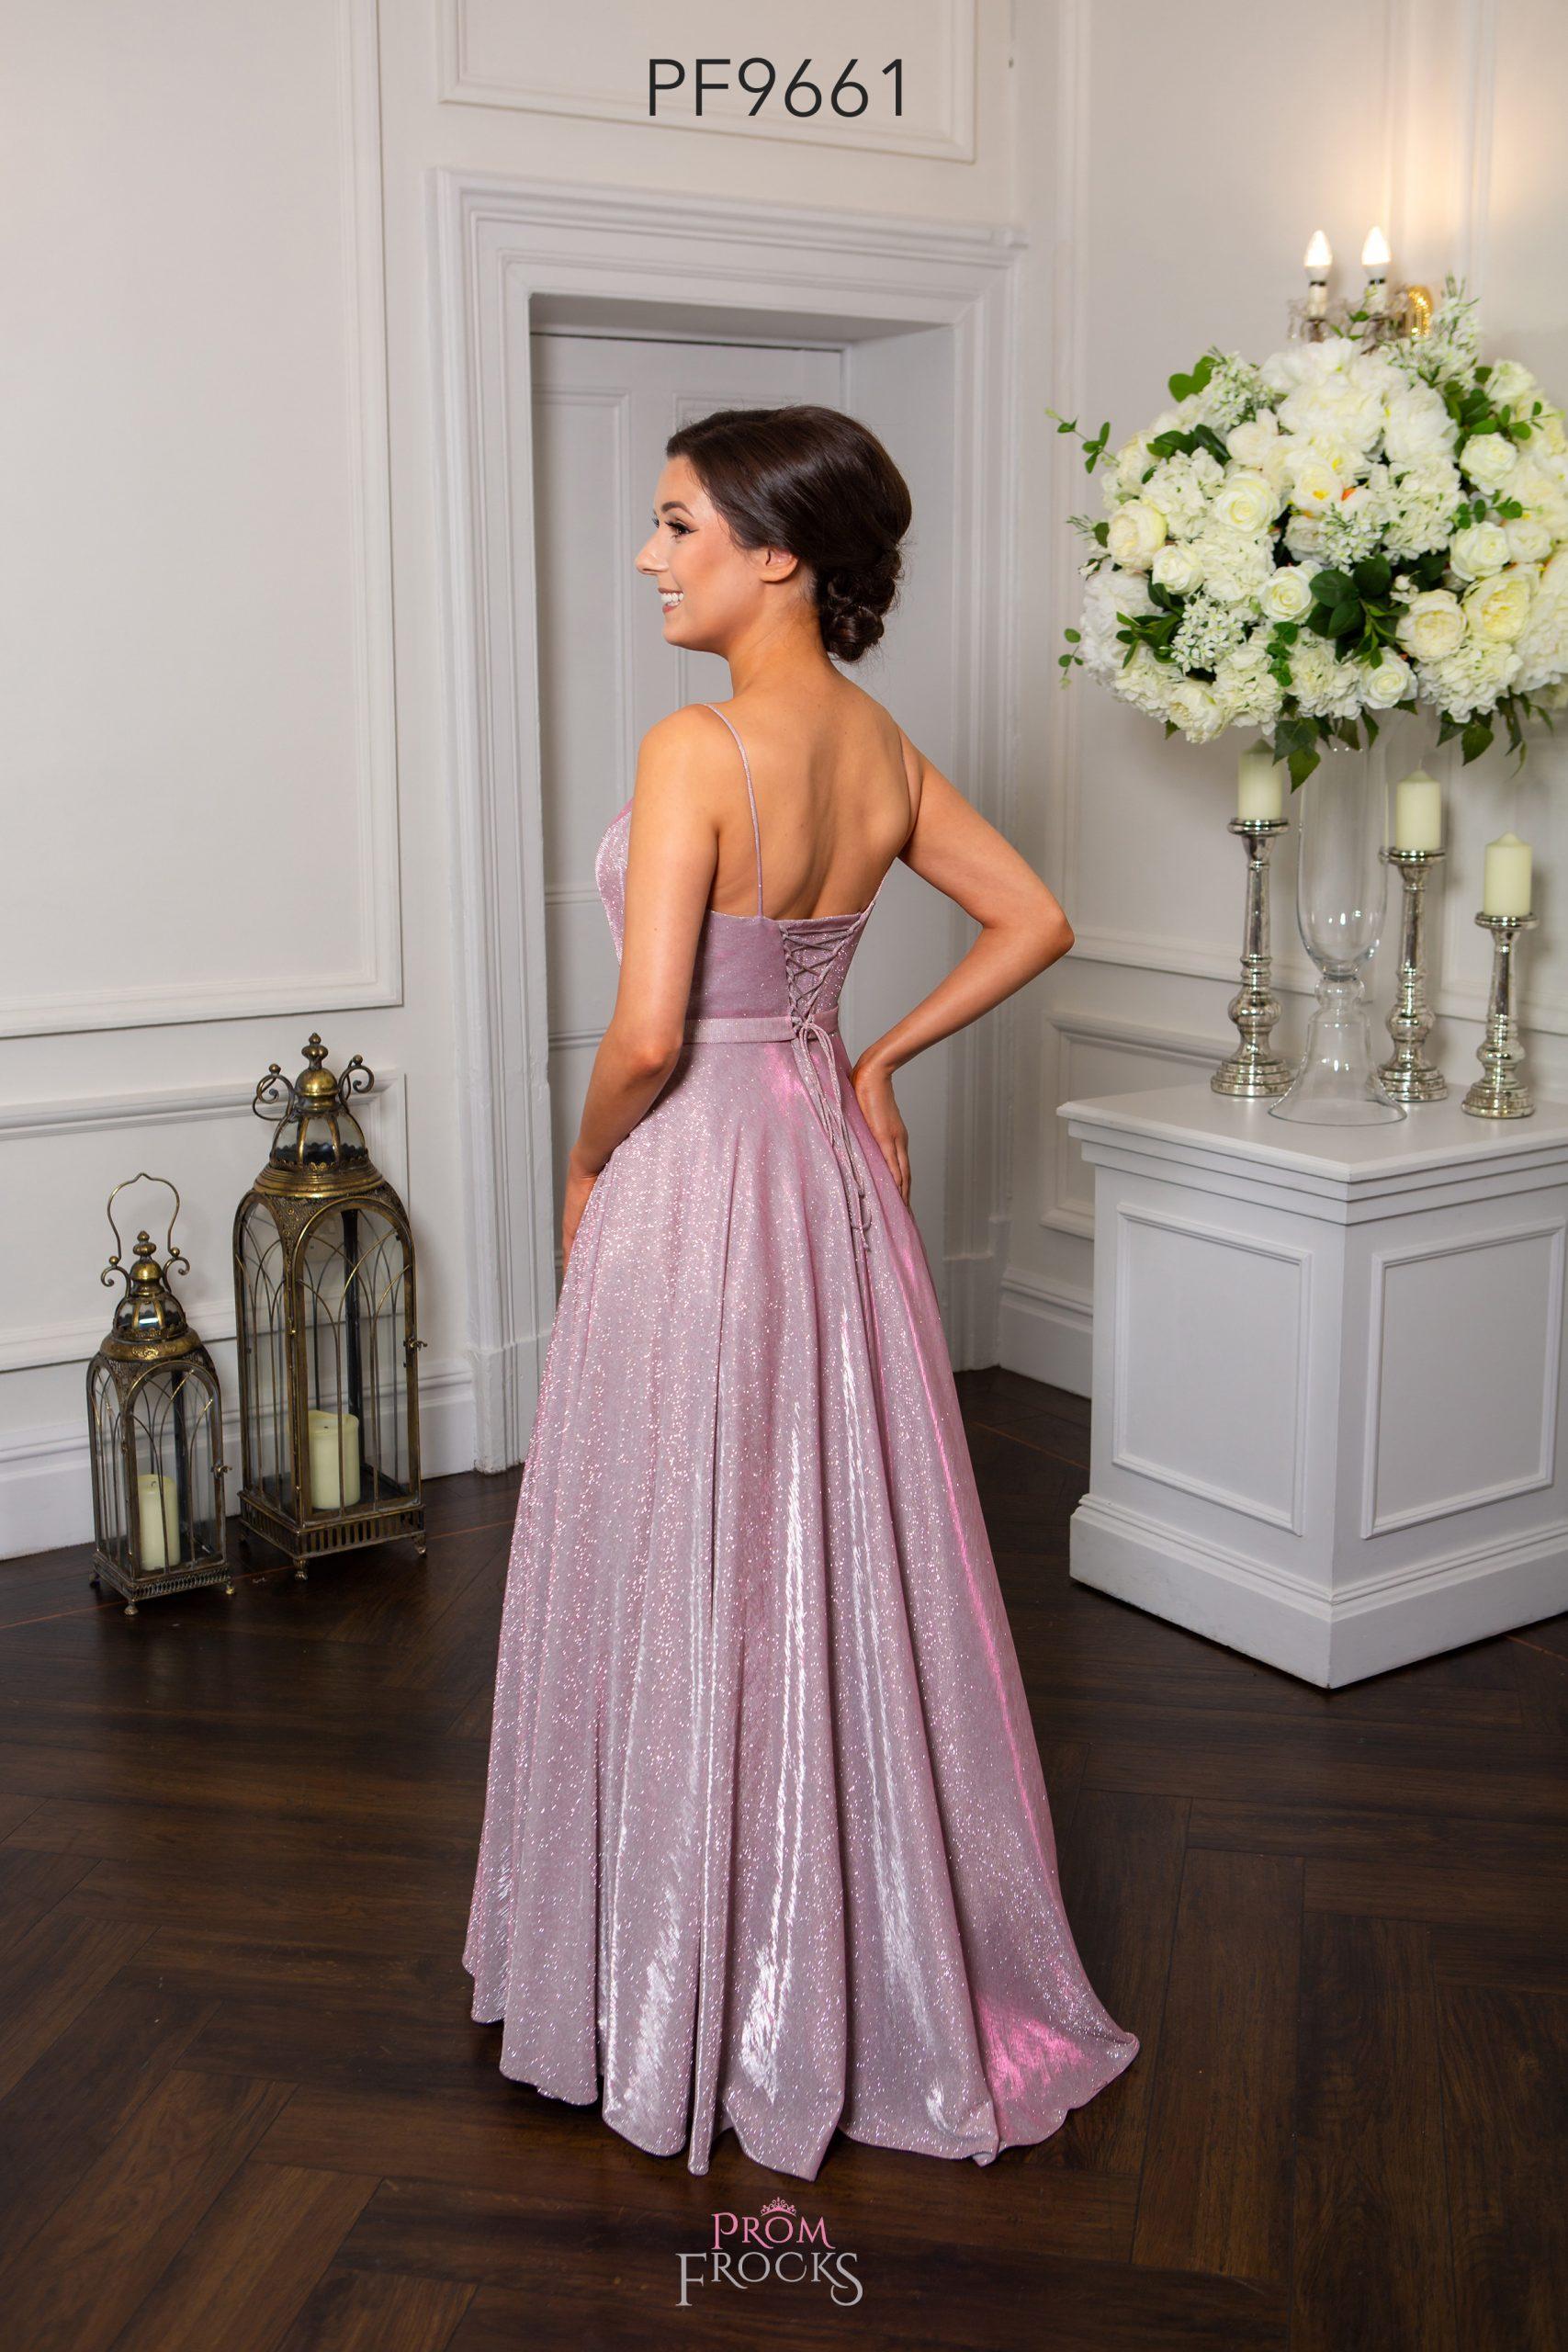 PF9661 Pink Sparkle Prom/Evening Dress - Prom Frocks UK